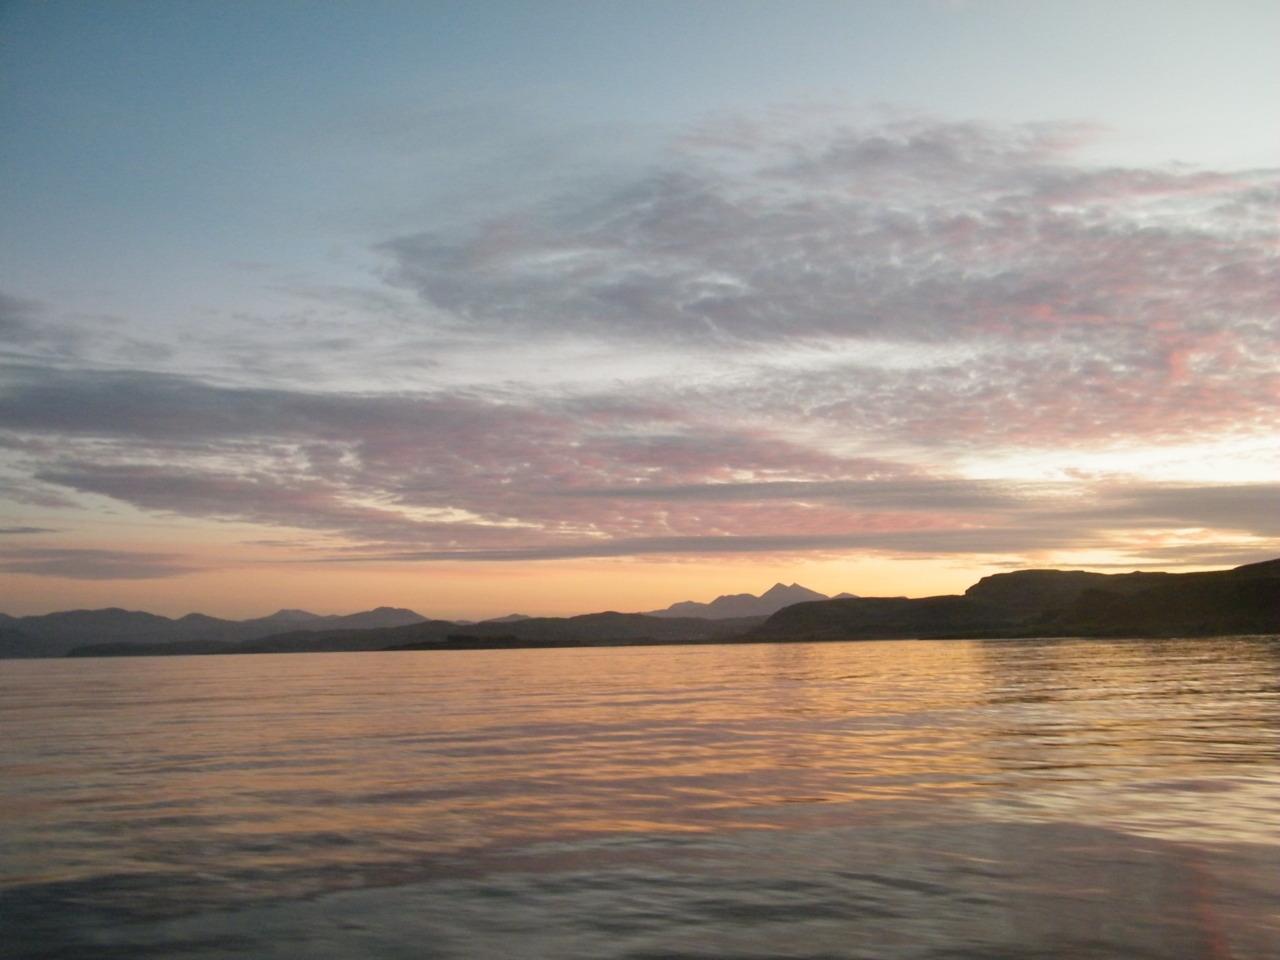 Sunrise over Argyll